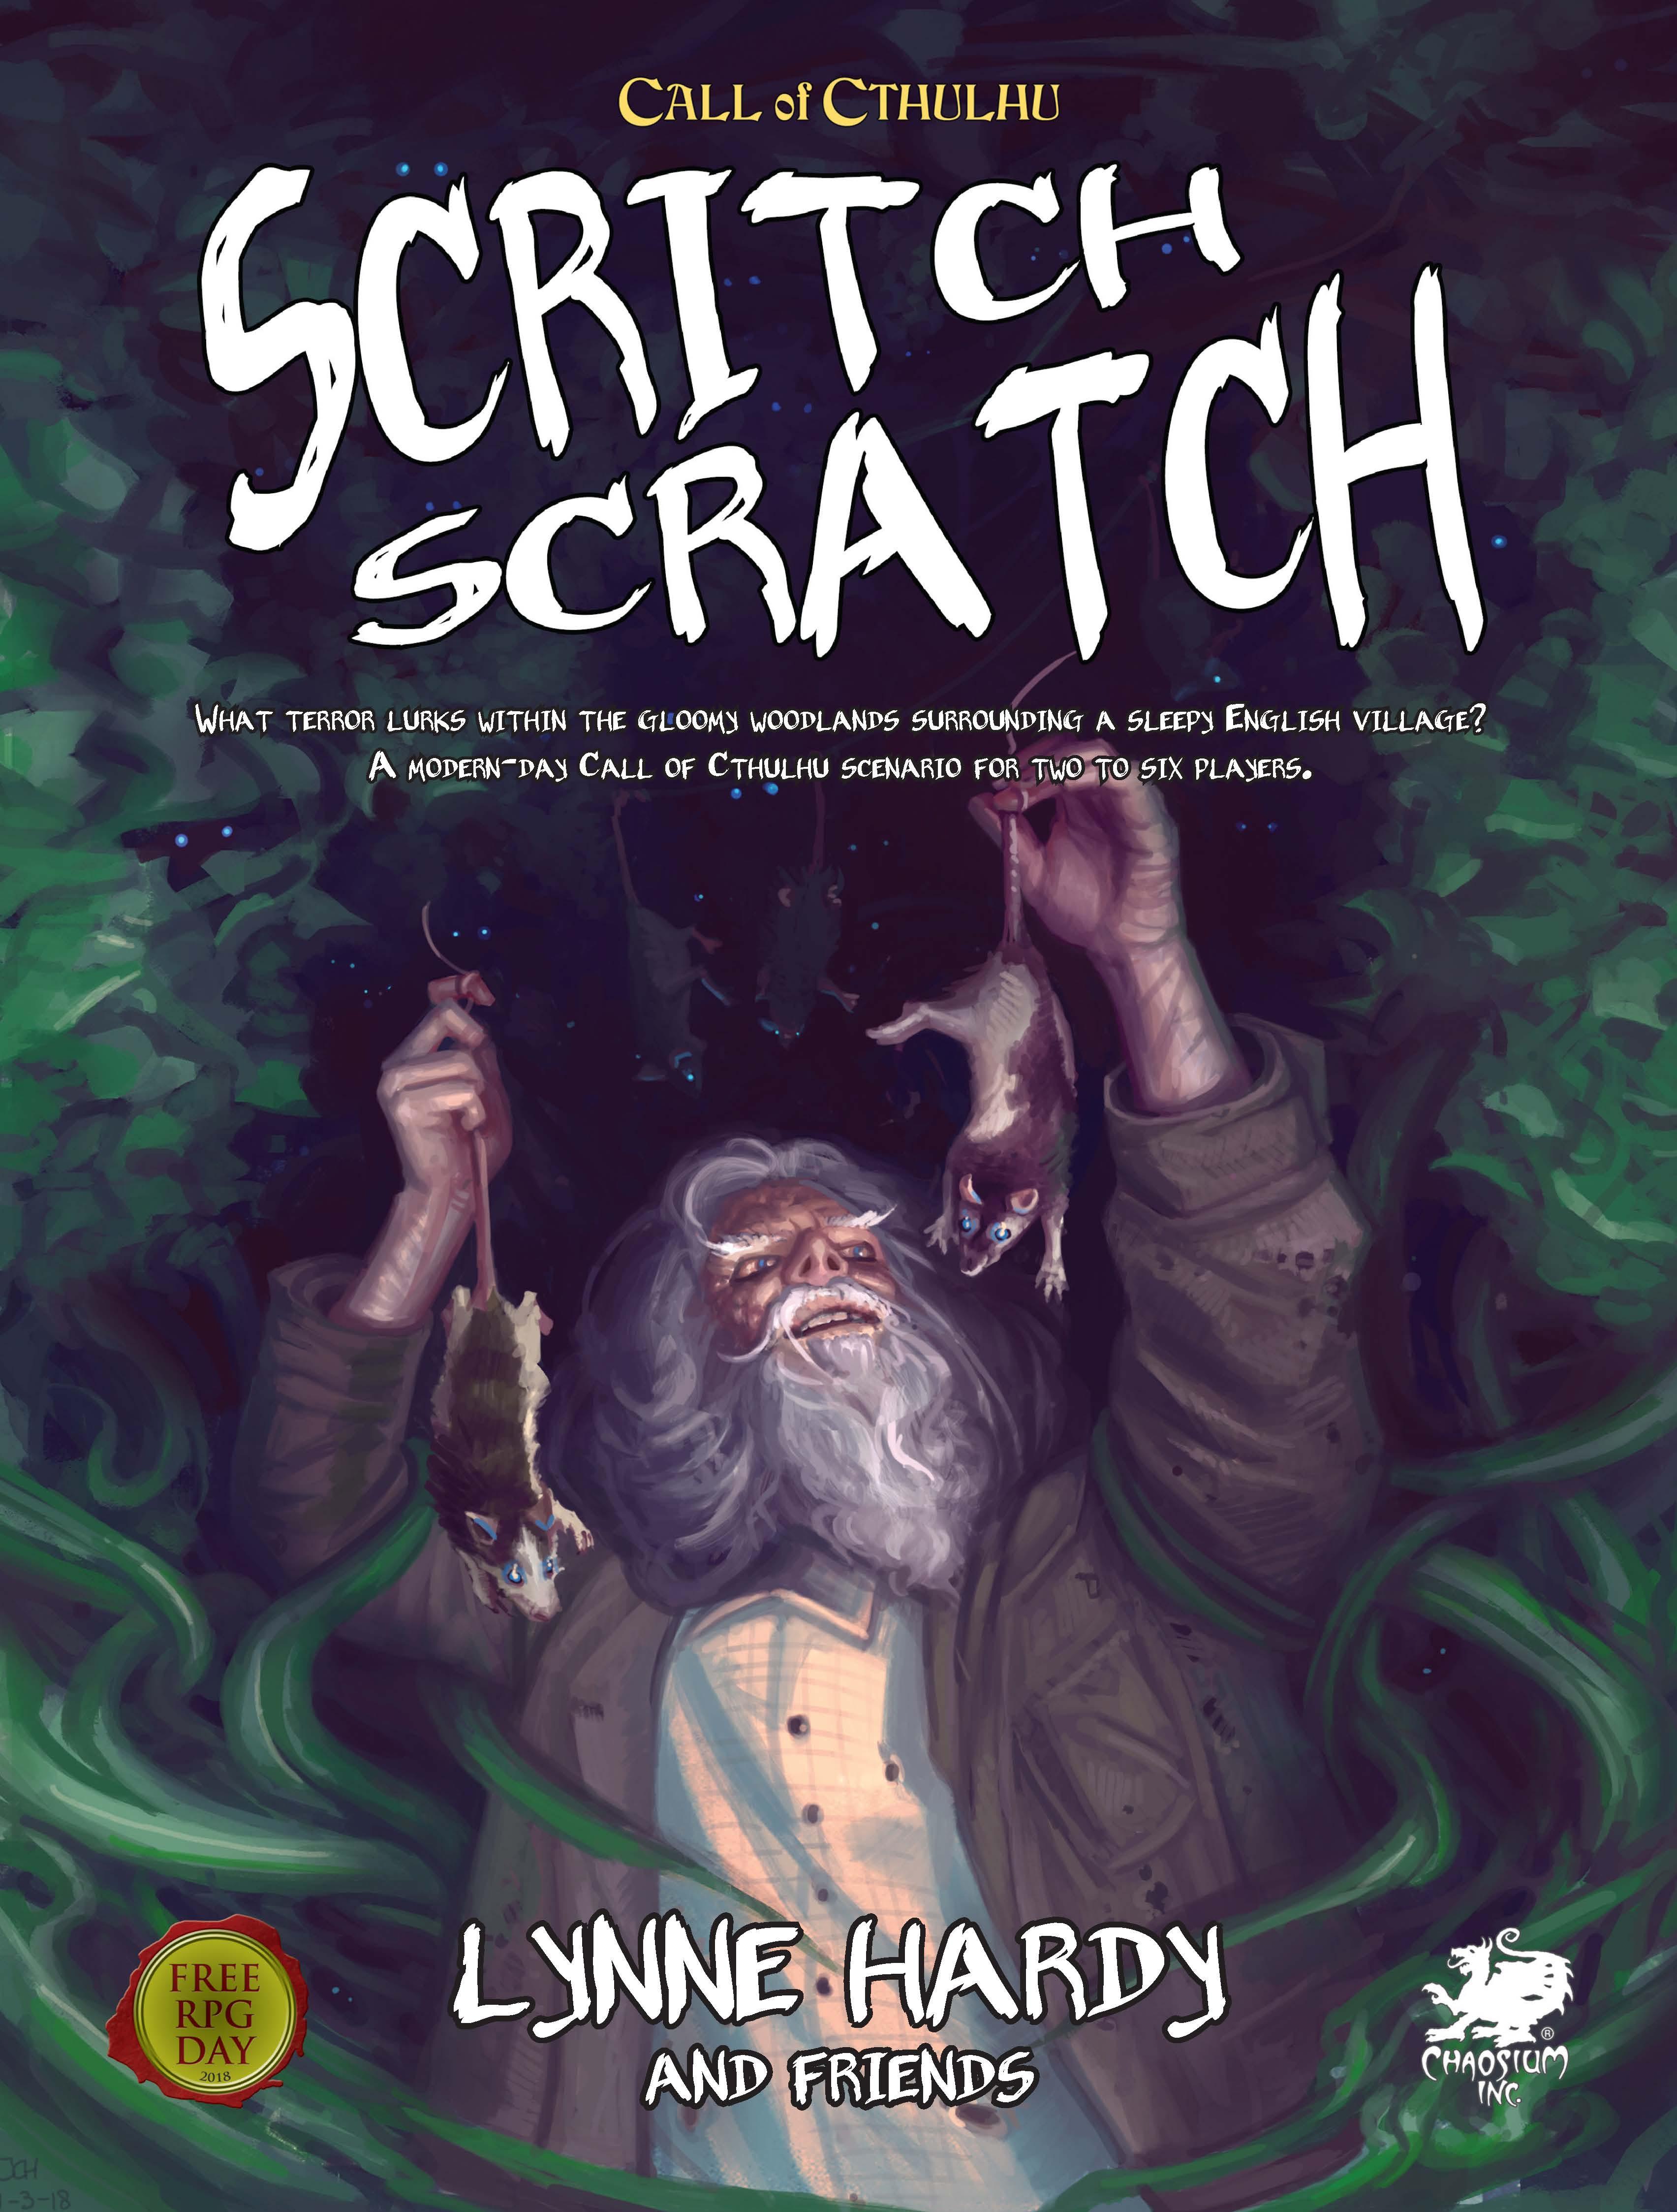 Scritch Scratch by Lynne Hardy